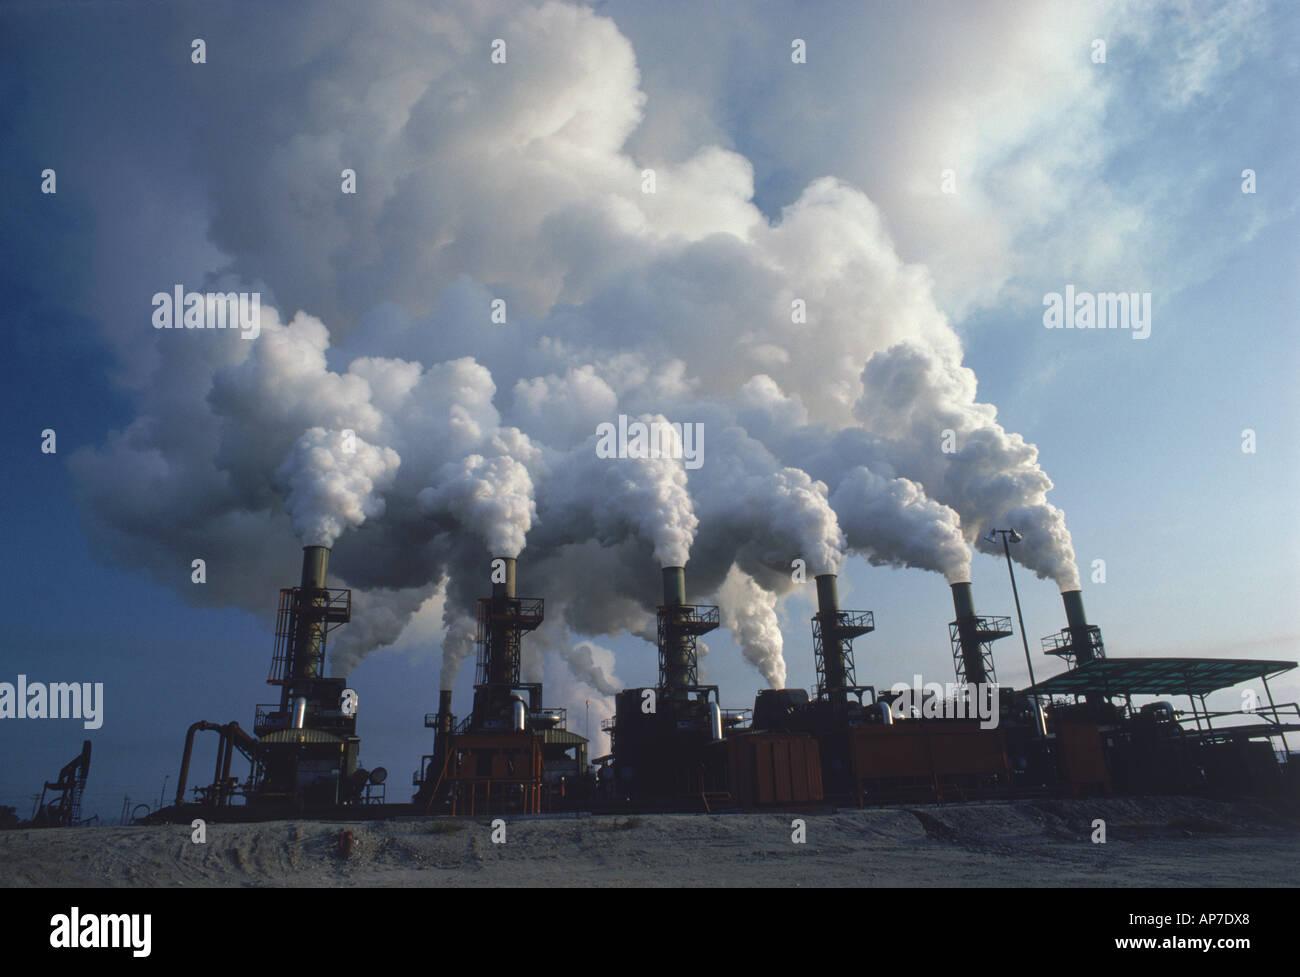 Oil refinery emitting air pollution near Santa Rosa, California - Stock Image